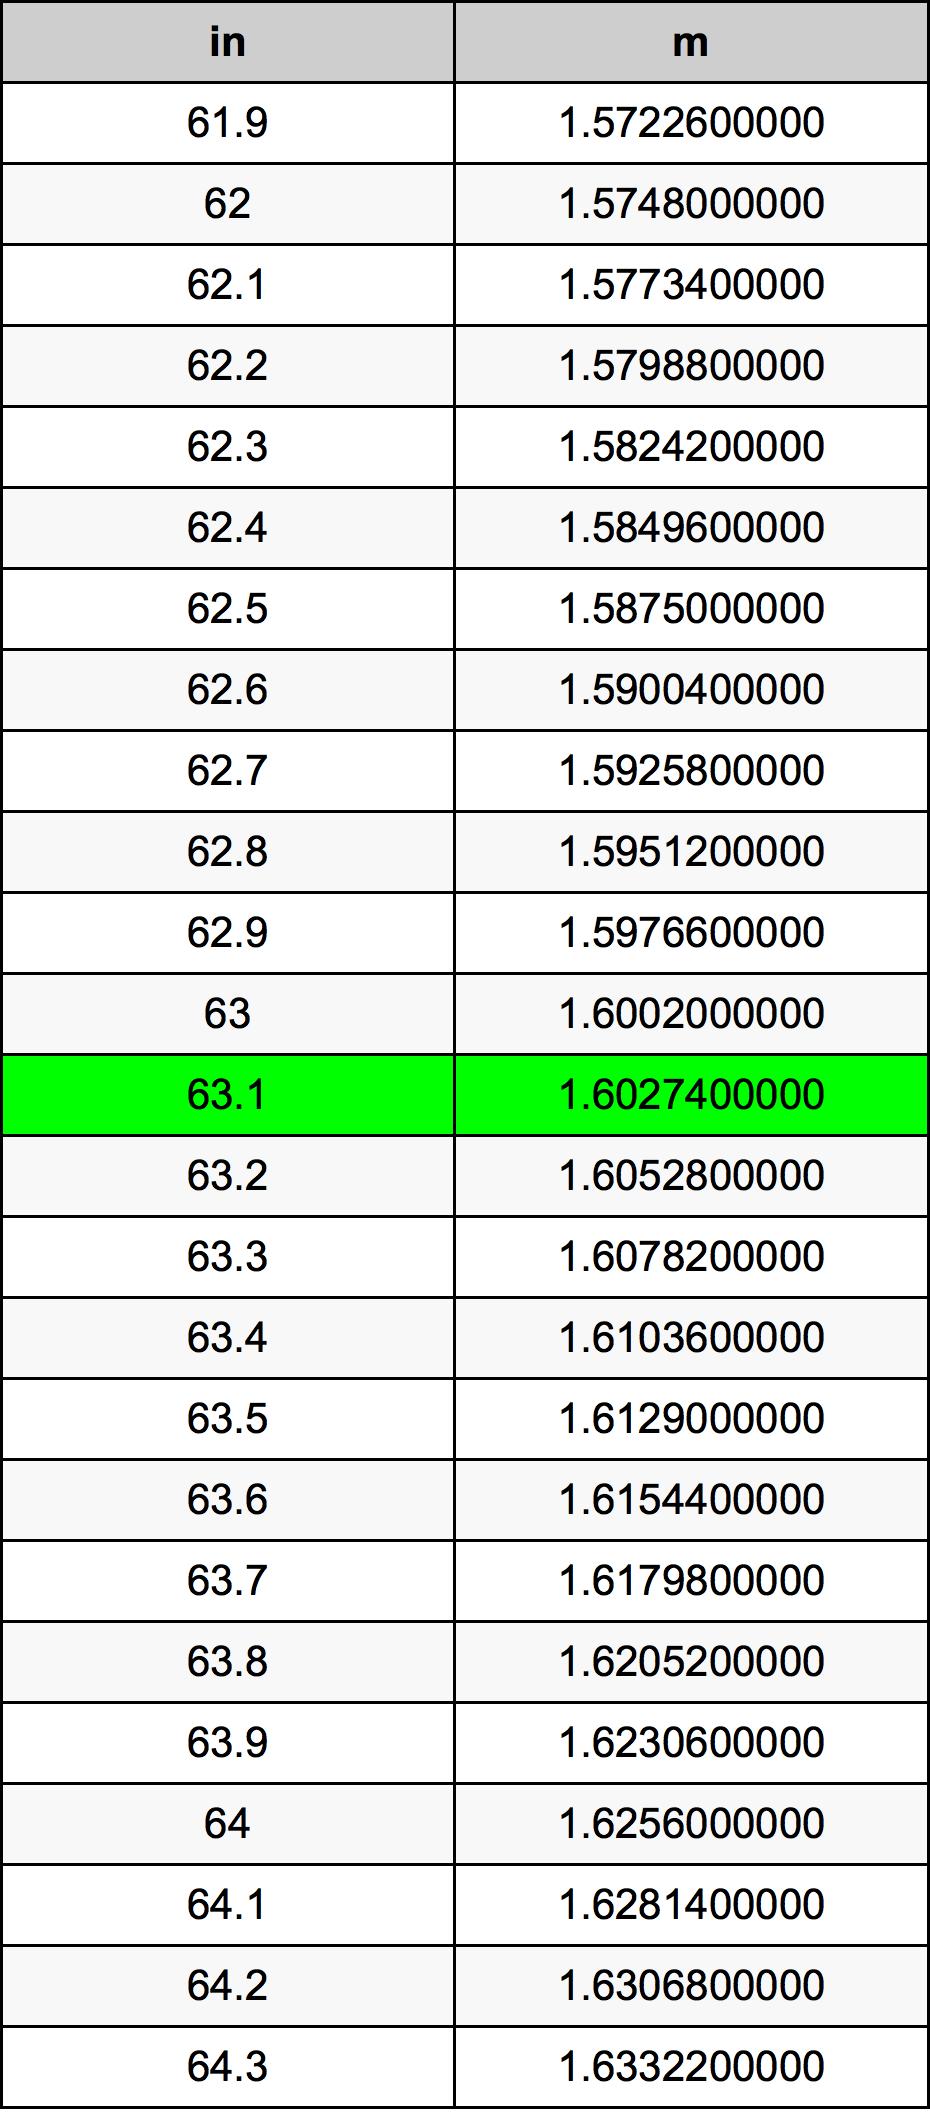 63.1 дюйм Таблица преобразования